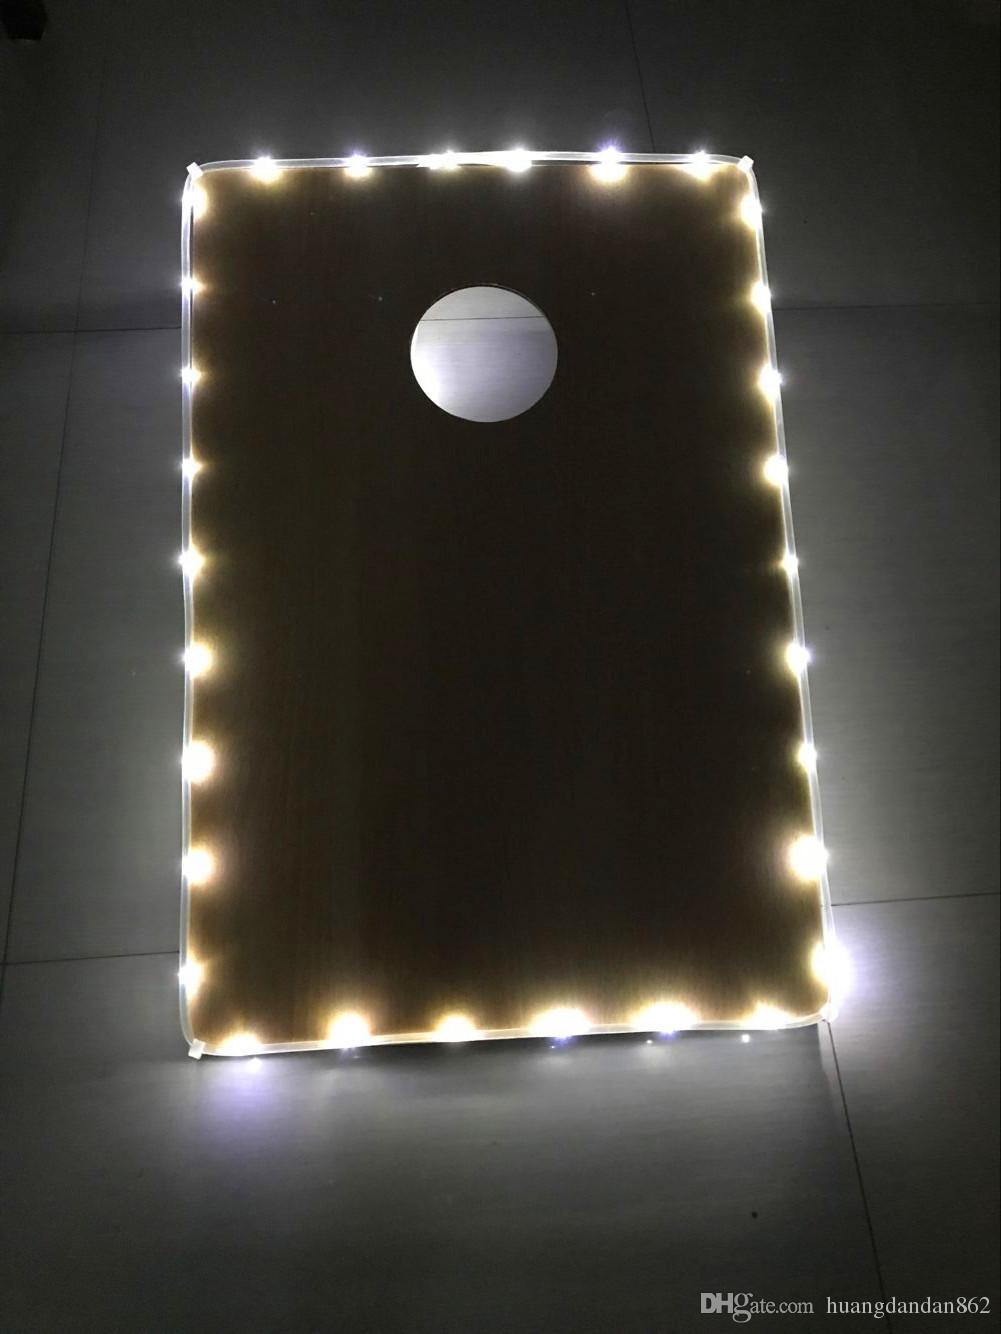 100PCS Rand Cornhole LED-Licht für cornhole Brett 1pc LED Cornhole Randbefeuerung MIX / MATCH FARBEN! -